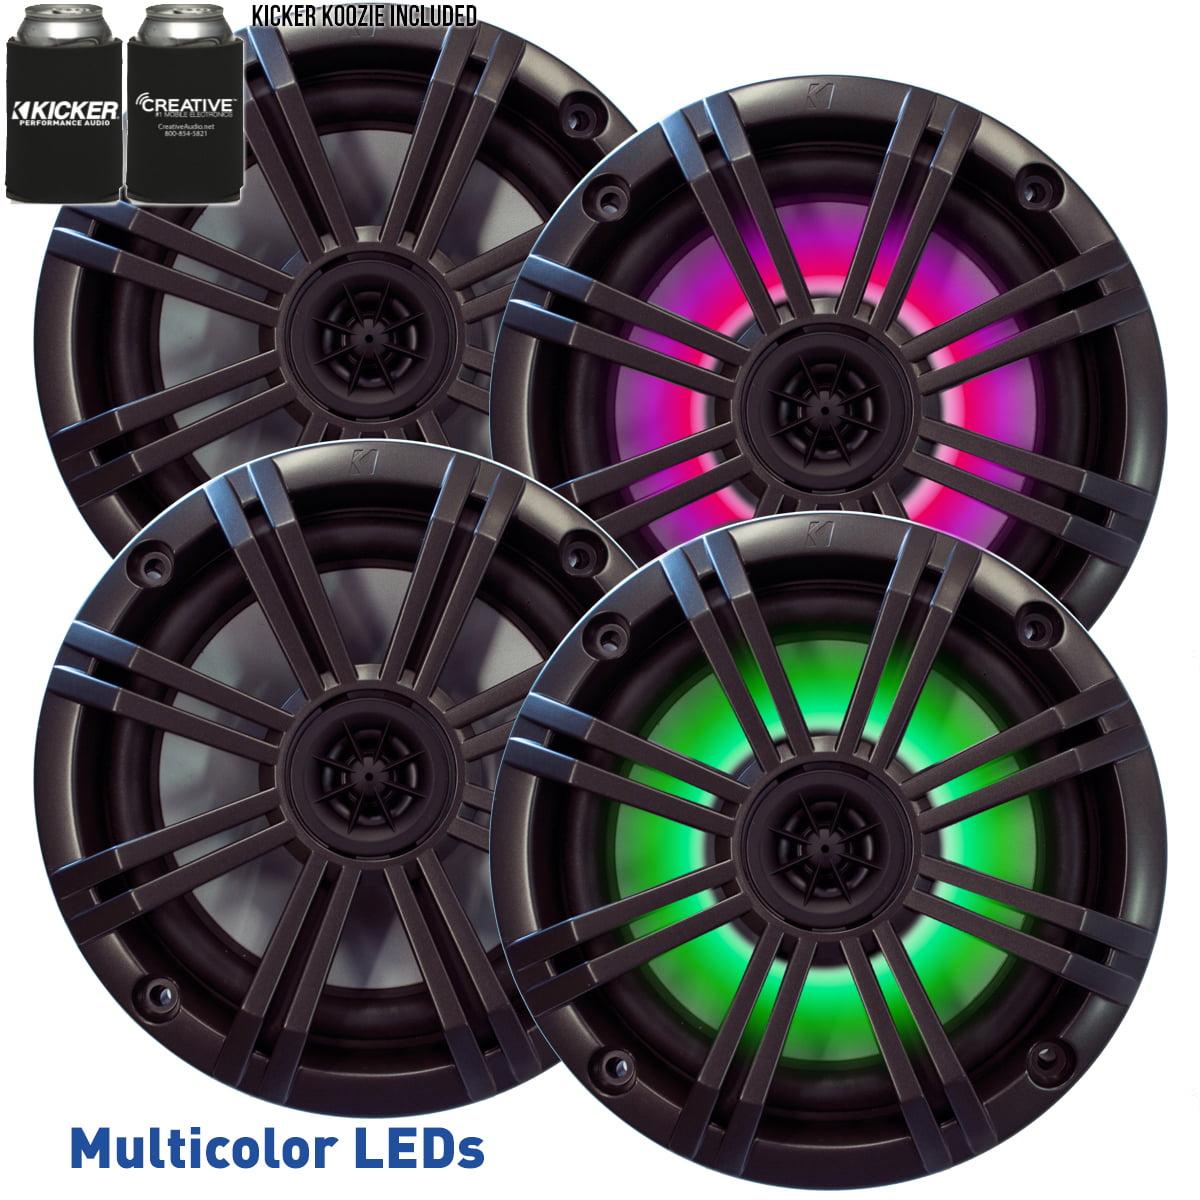 Kicker 6.5 Silver LED Marine Speakers Qty 2 1 Pair of OEM Replacement Speakers